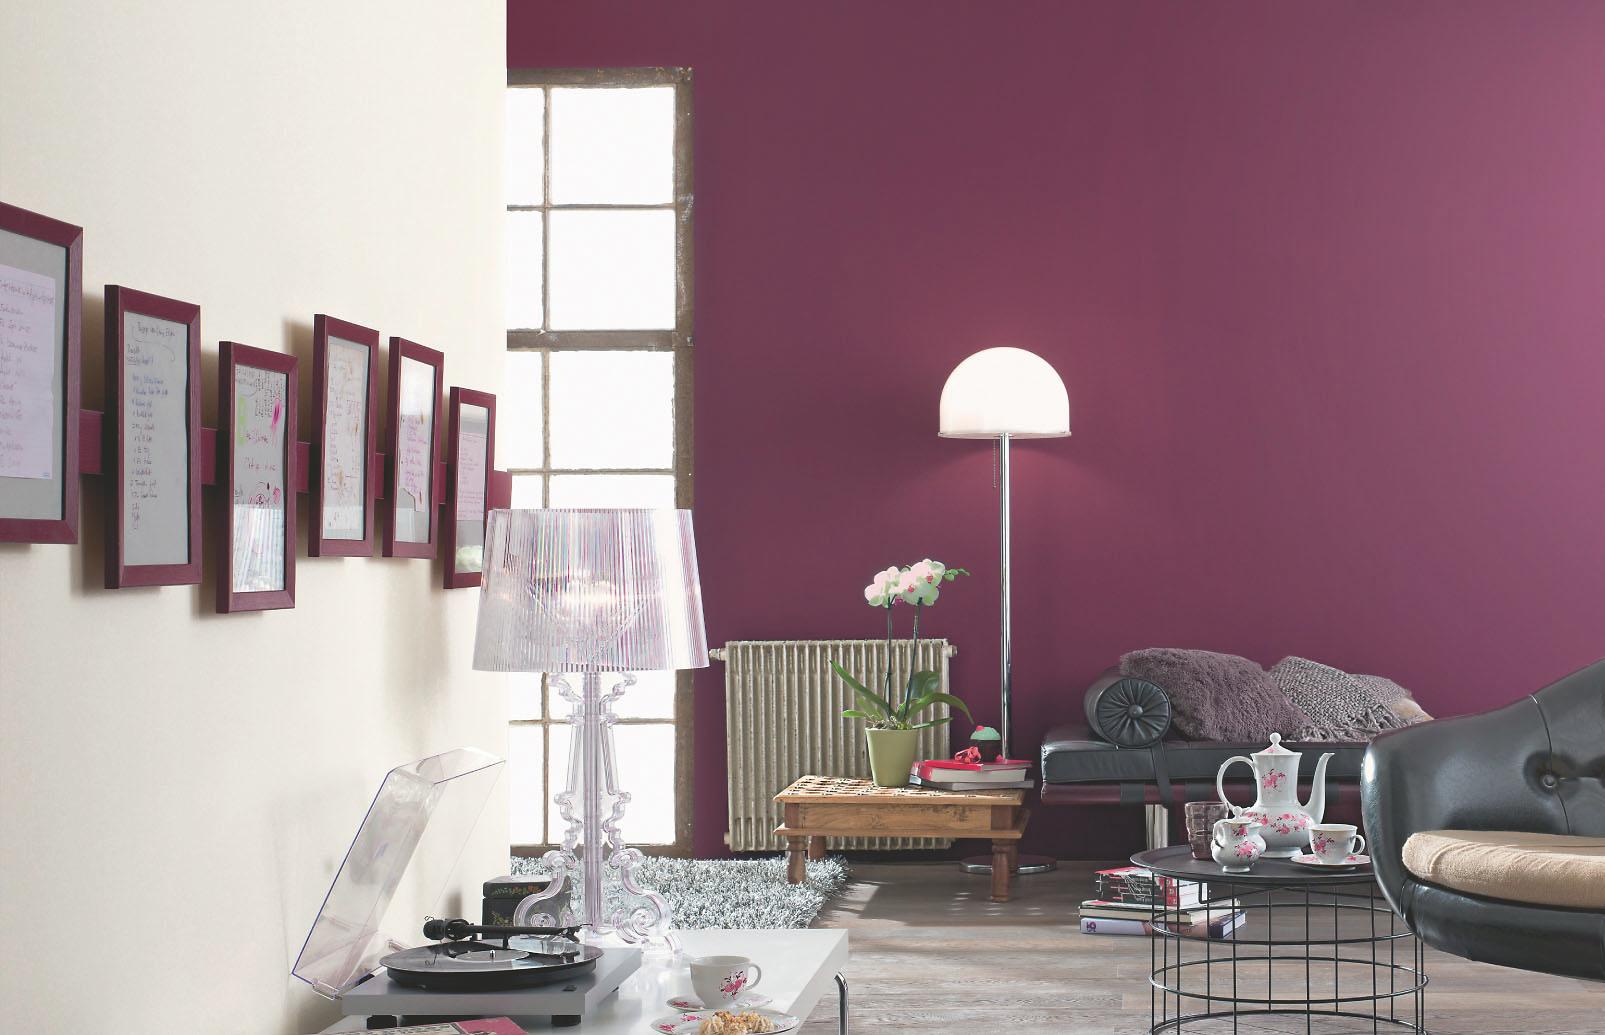 Kreative Raumgestaltung durch Lackieren: Alpina Farbe & Inspiration